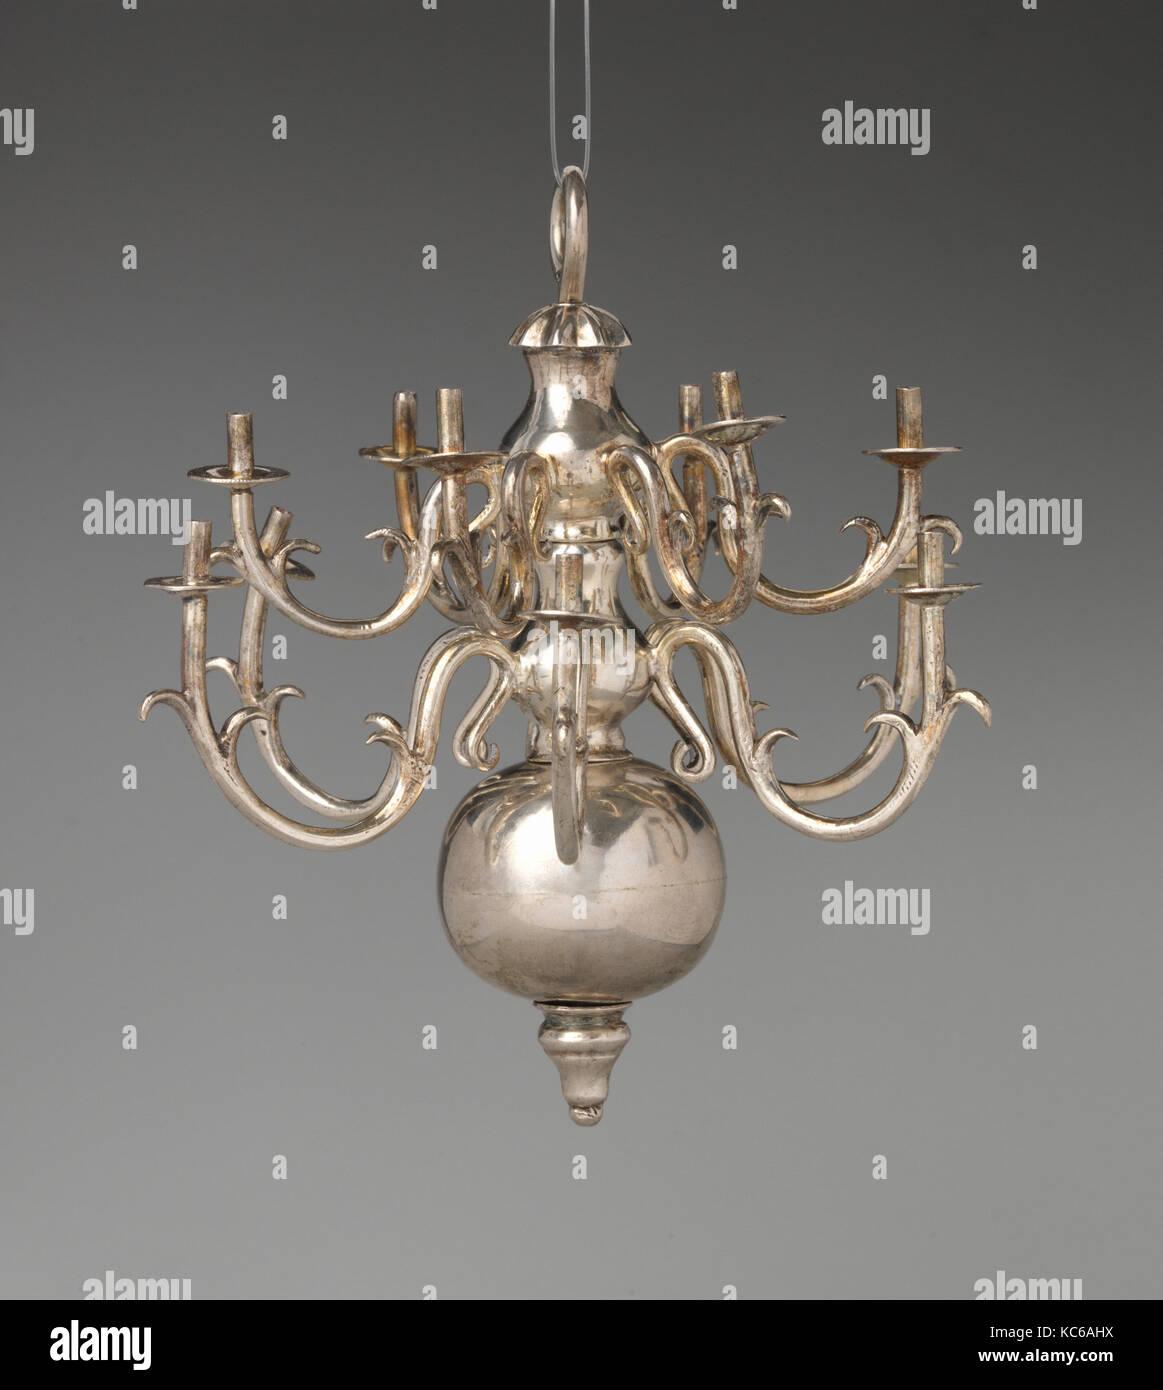 Miniature chandelier stock photos miniature chandelier stock miniature chandelier ca 1720 dutch amsterdam silver 4 5 arubaitofo Image collections